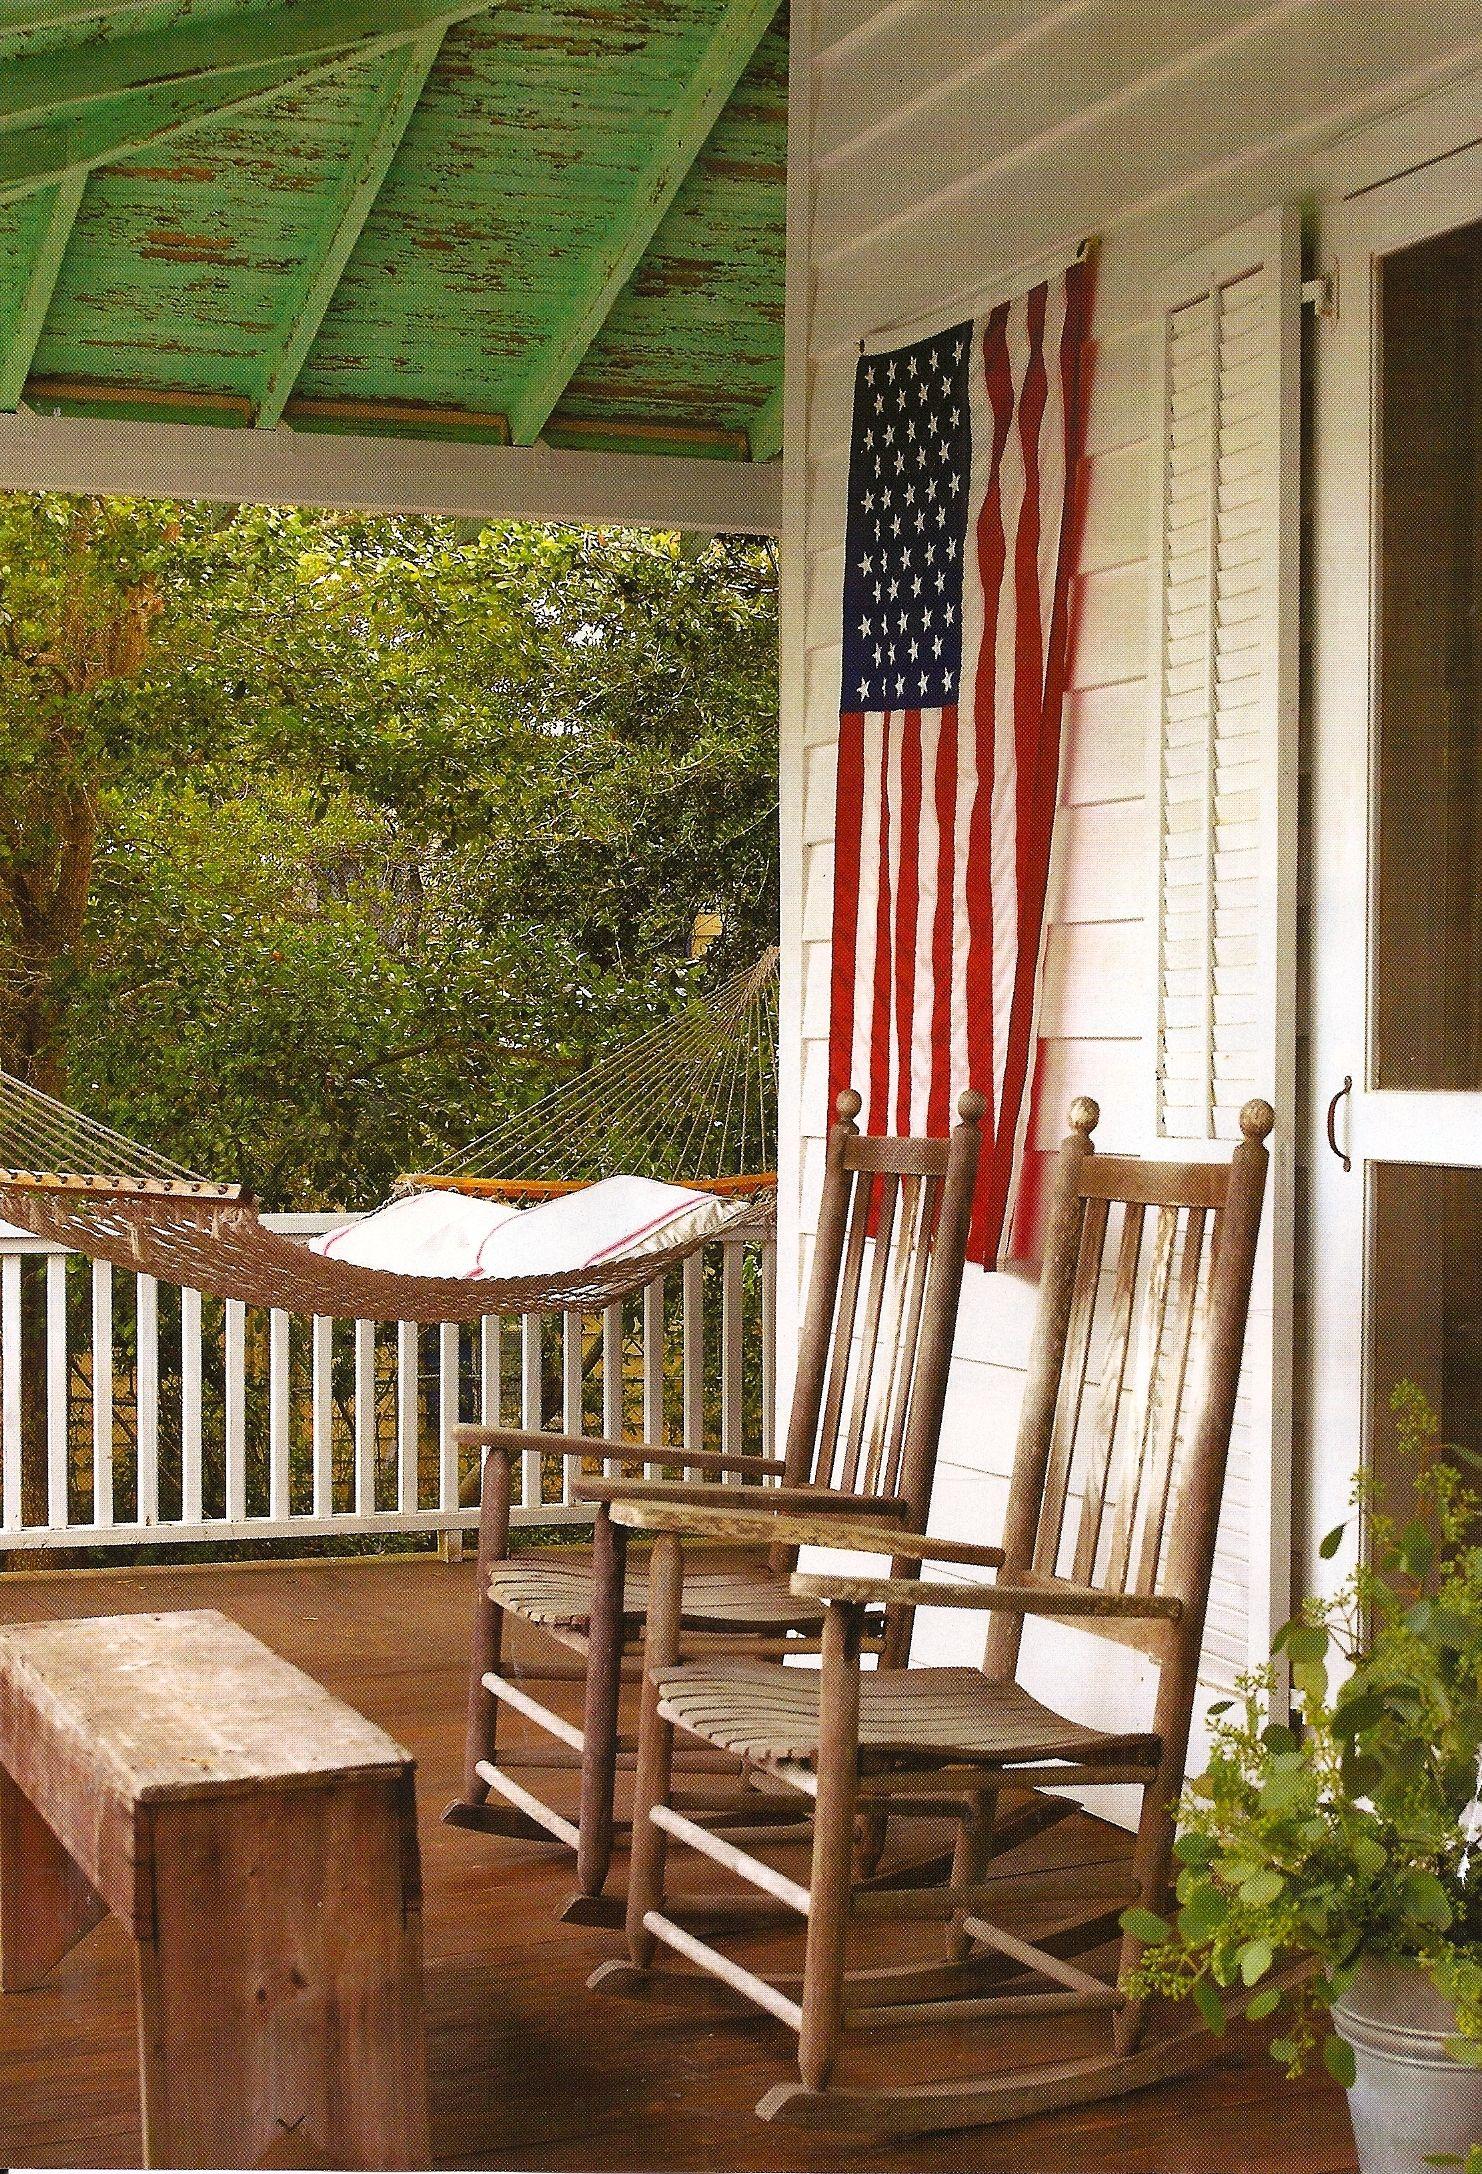 Strange American Porch In 2019 Rocking Chair Porch Home Porch Swing Inzonedesignstudio Interior Chair Design Inzonedesignstudiocom